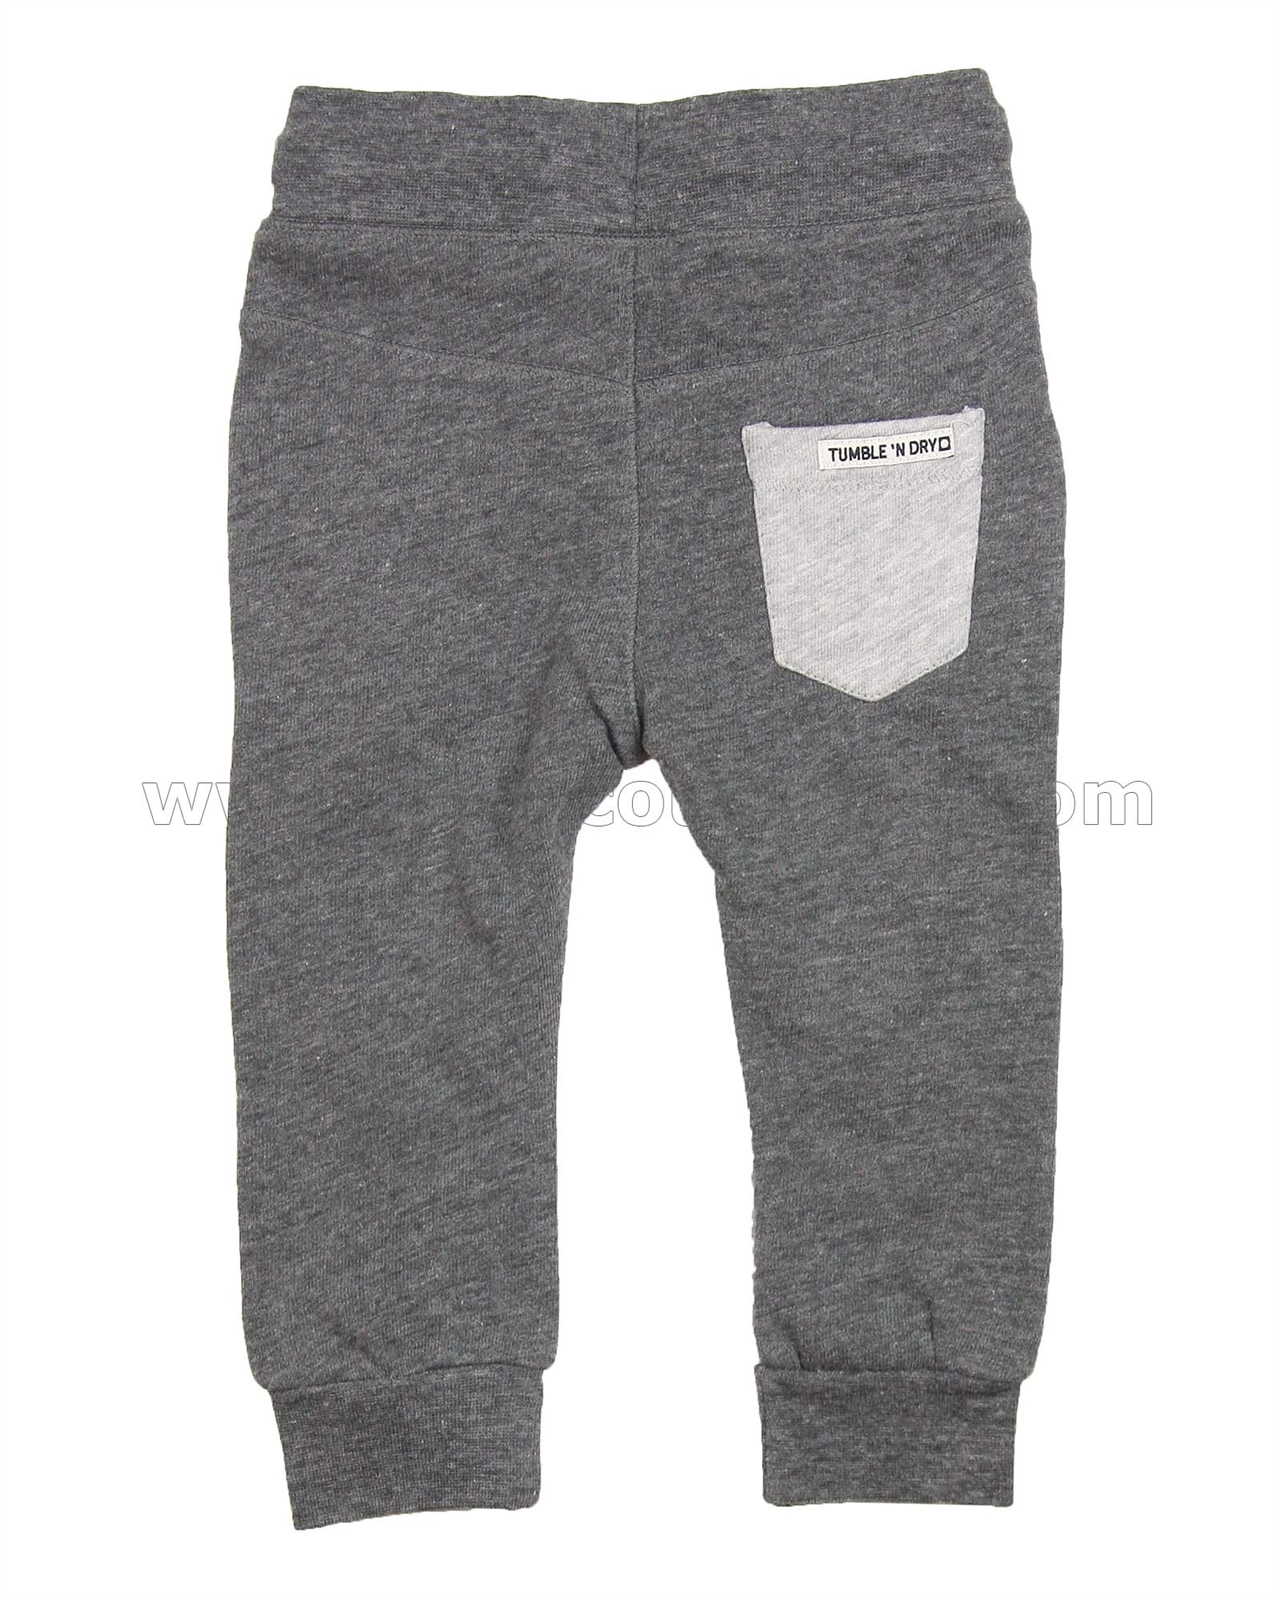 8edff4fb Tumble n Dry Baby Boys' Jogger Pants Patrice